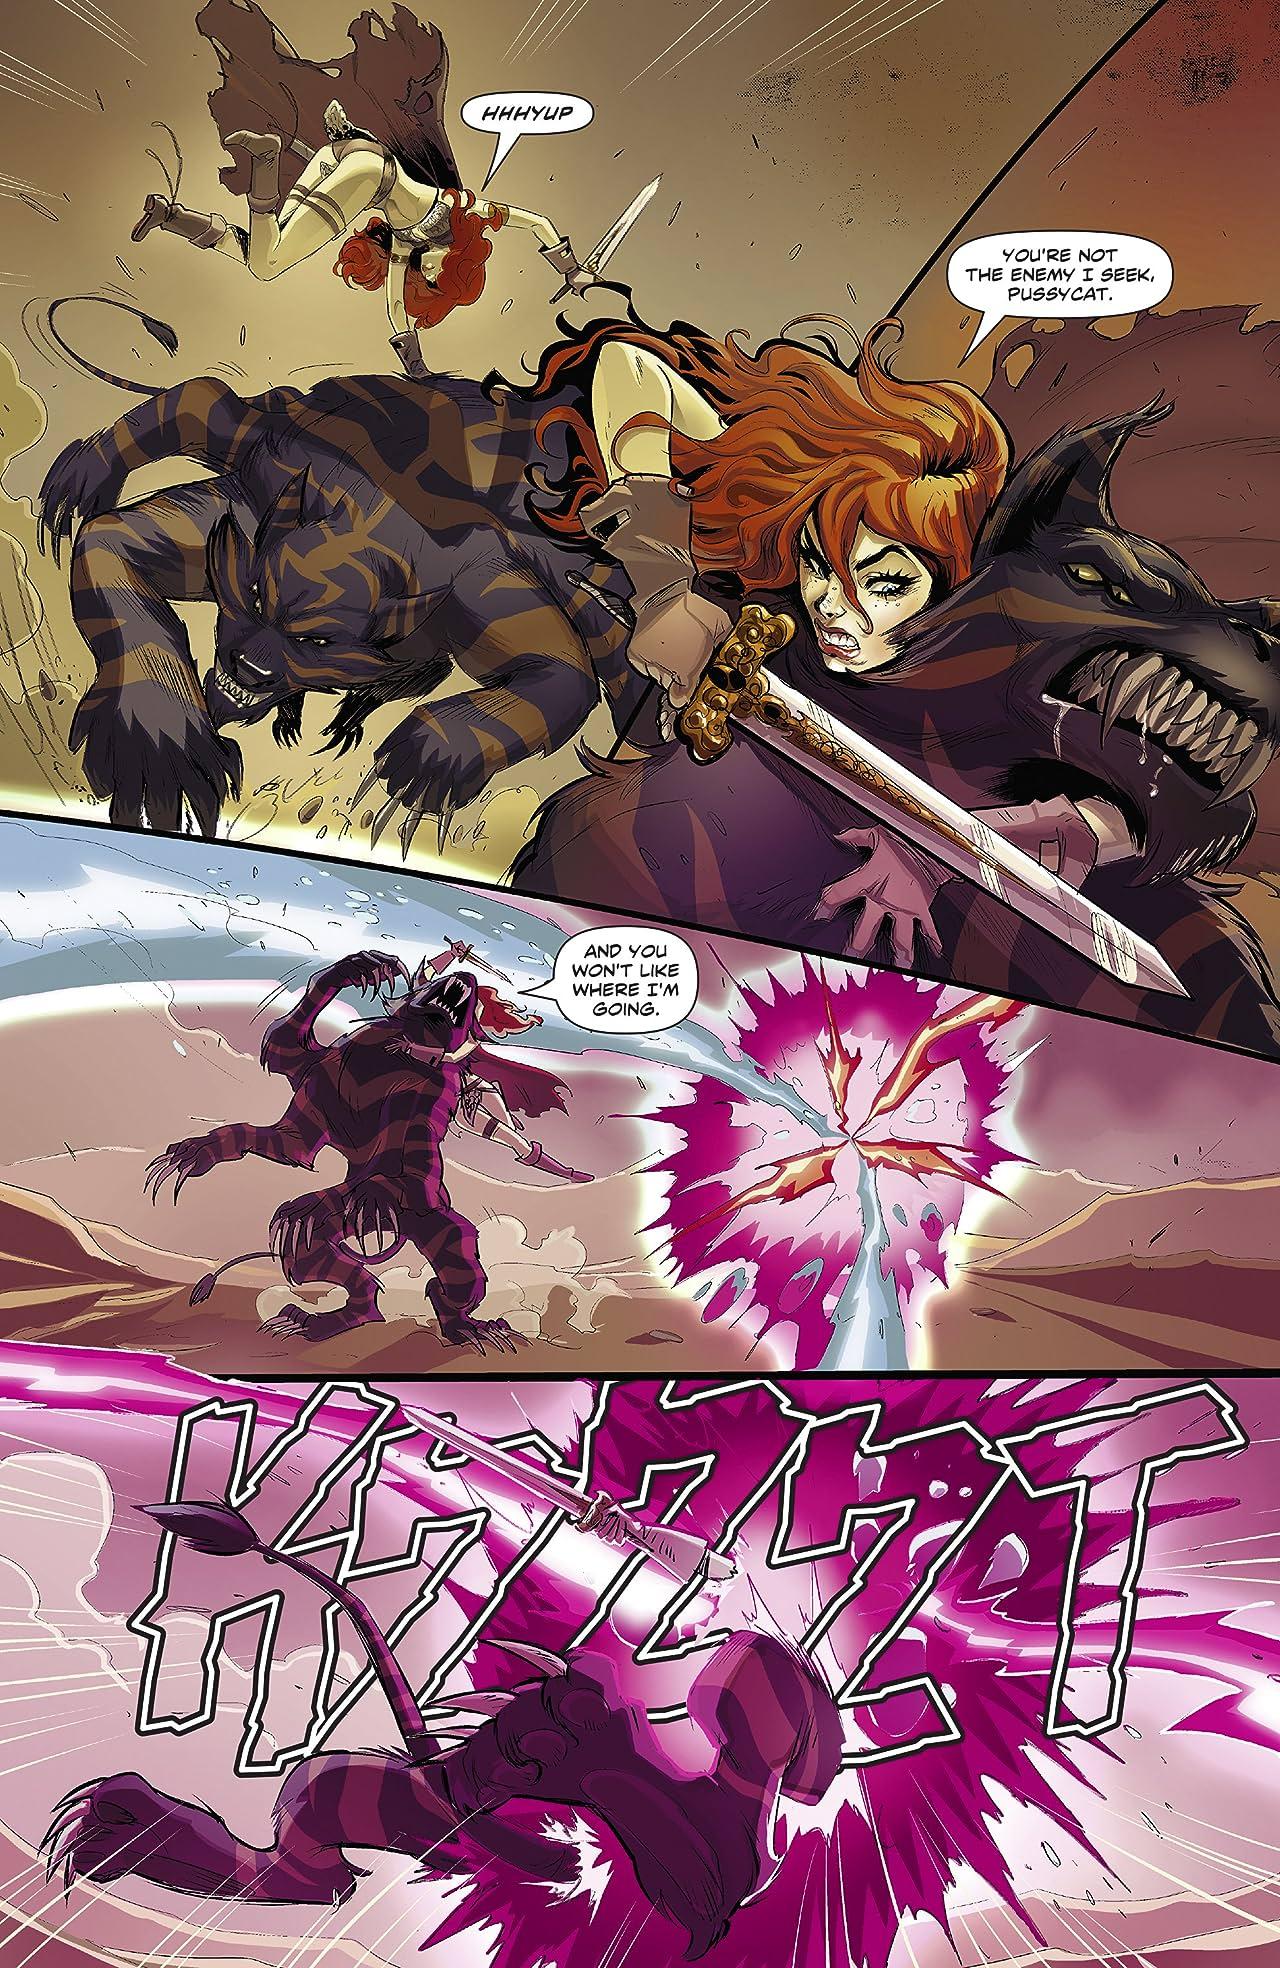 Swords of Sorrow: Red Sonja & Jungle Girl #1 (of 3)